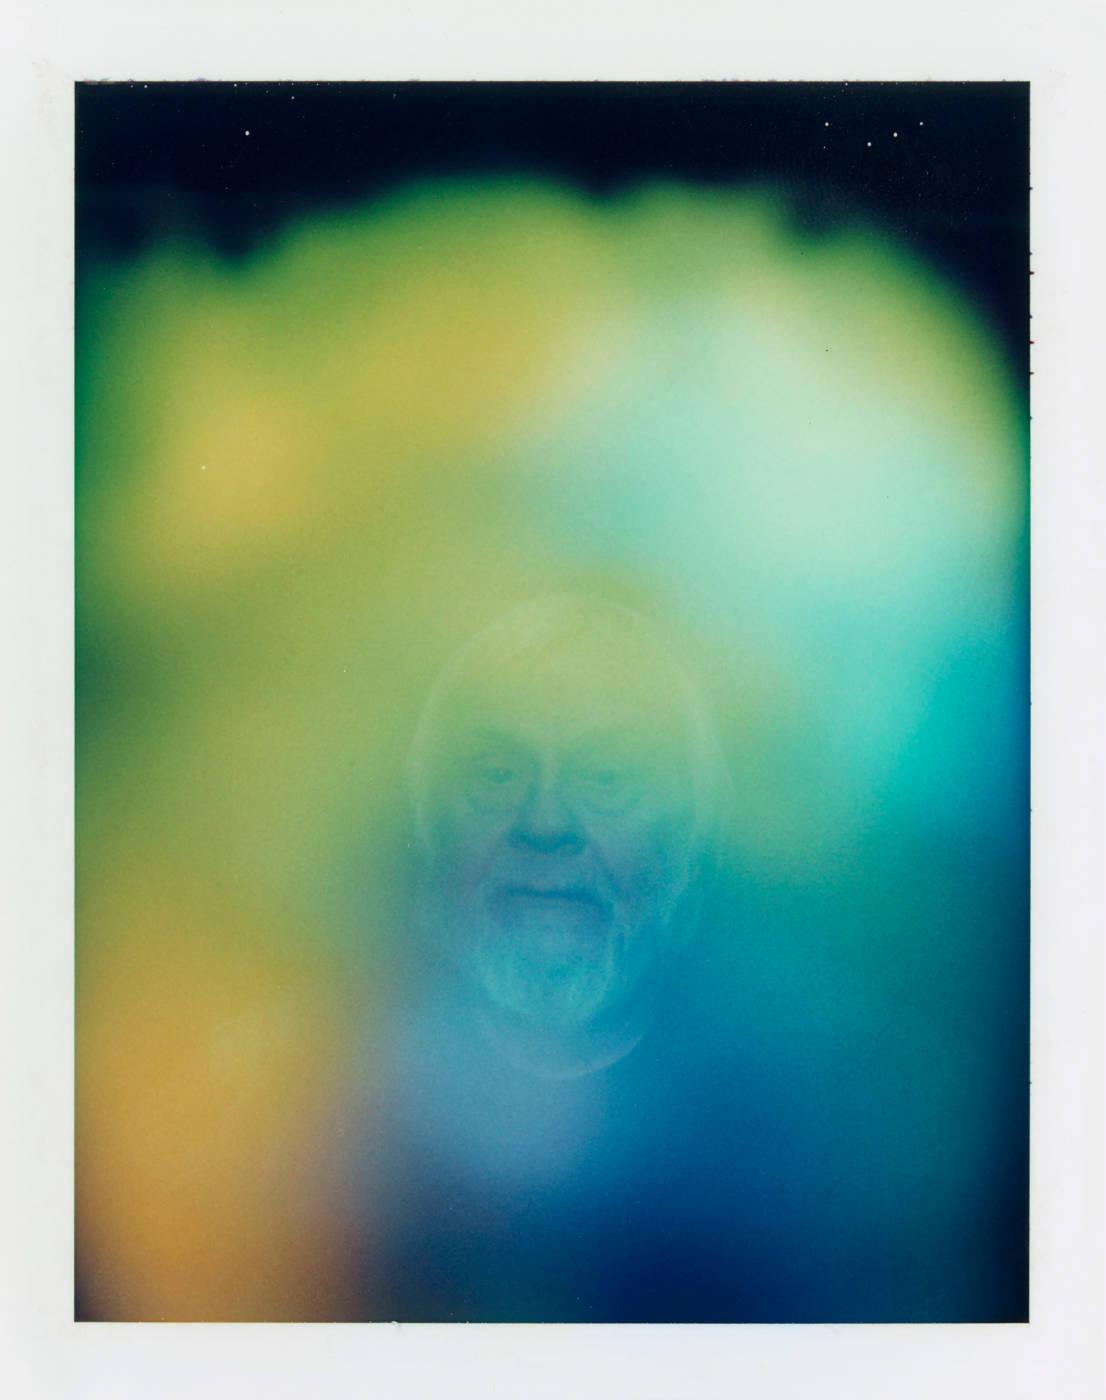 Portrait of man enveloped in hazy gradient color